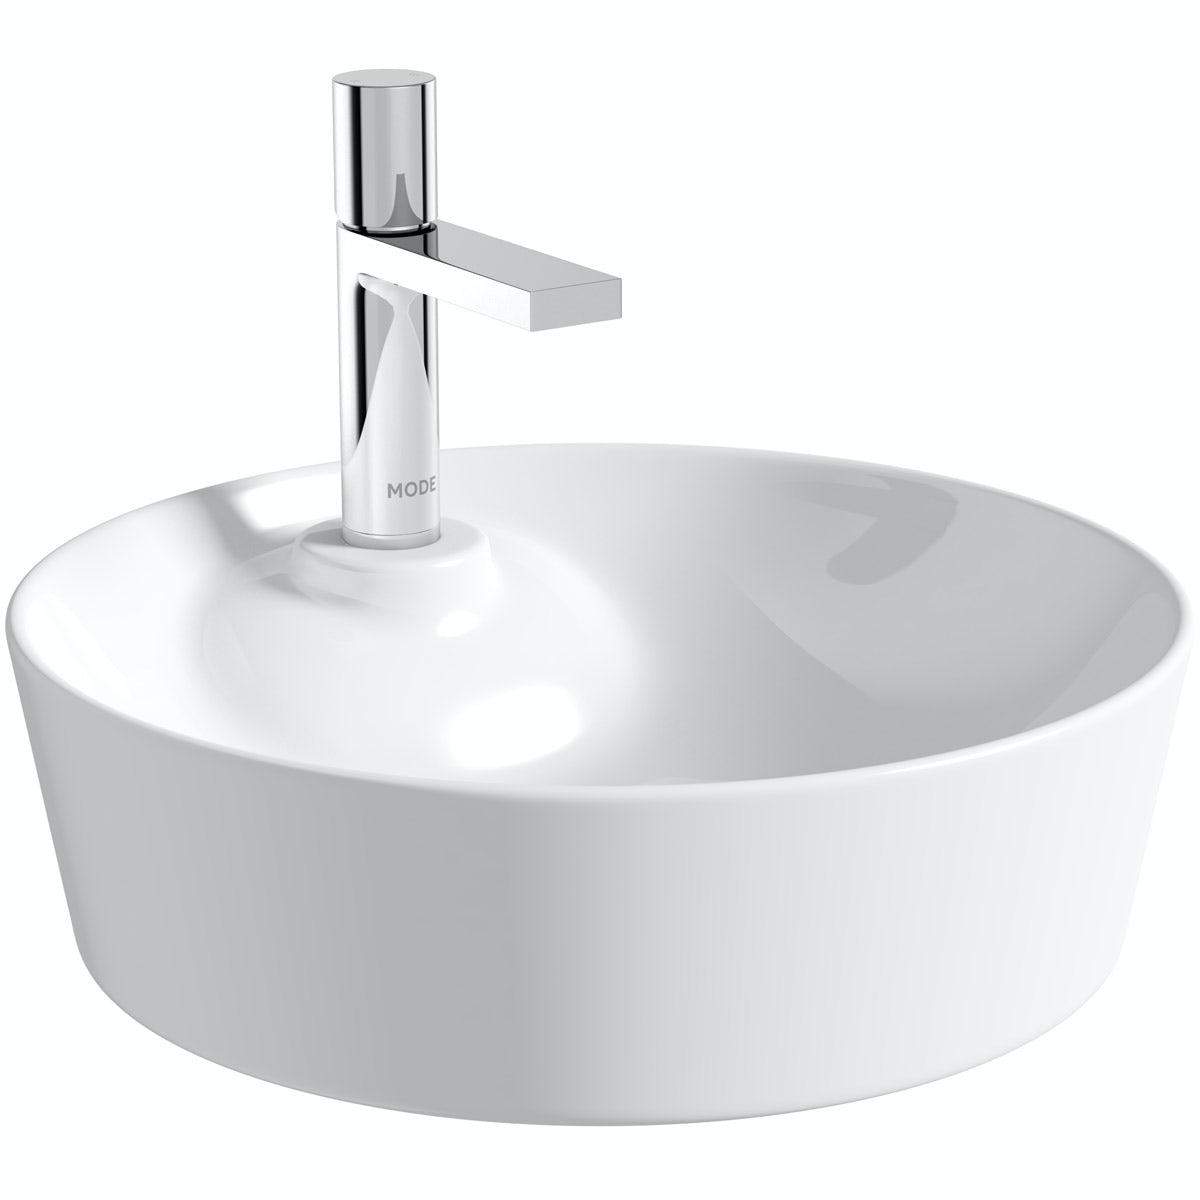 Mode Fairey round thin edge 1 tap hole basin 450mm